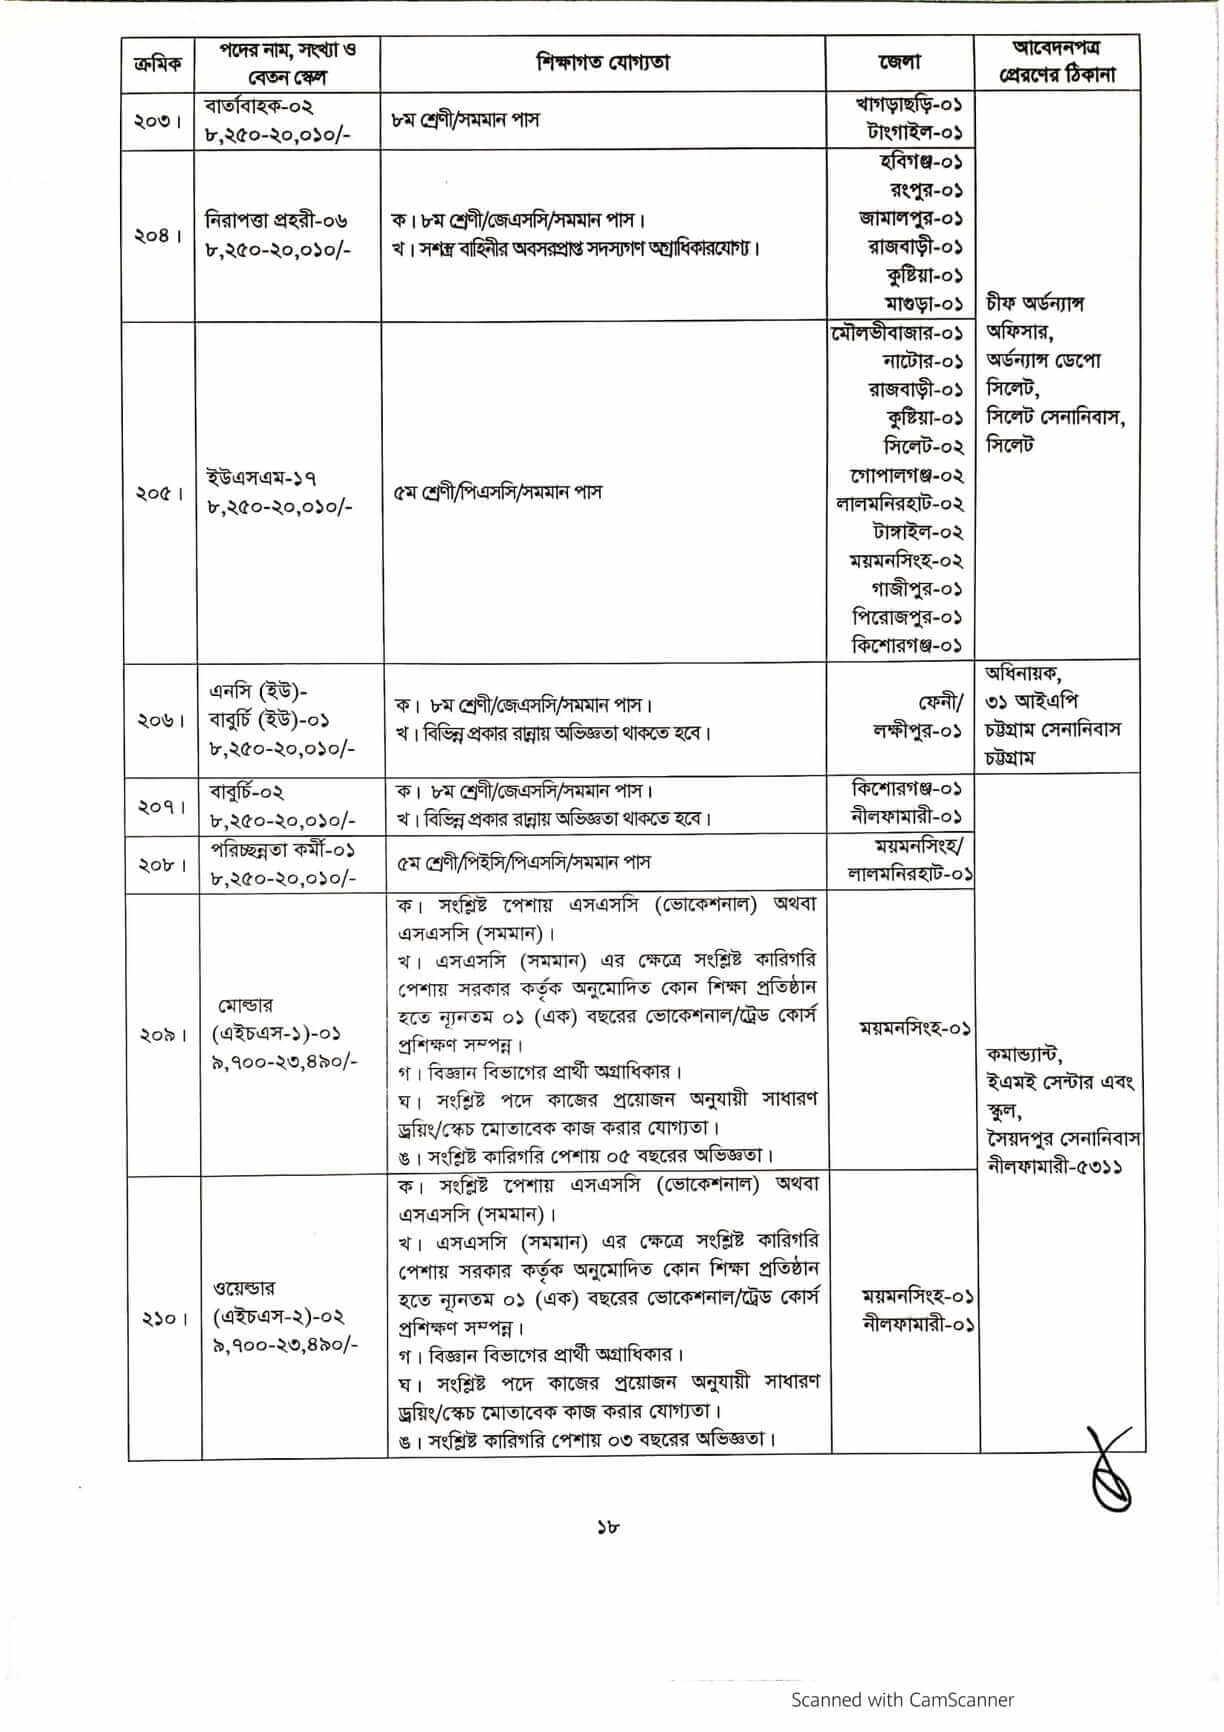 Army civilian job circular